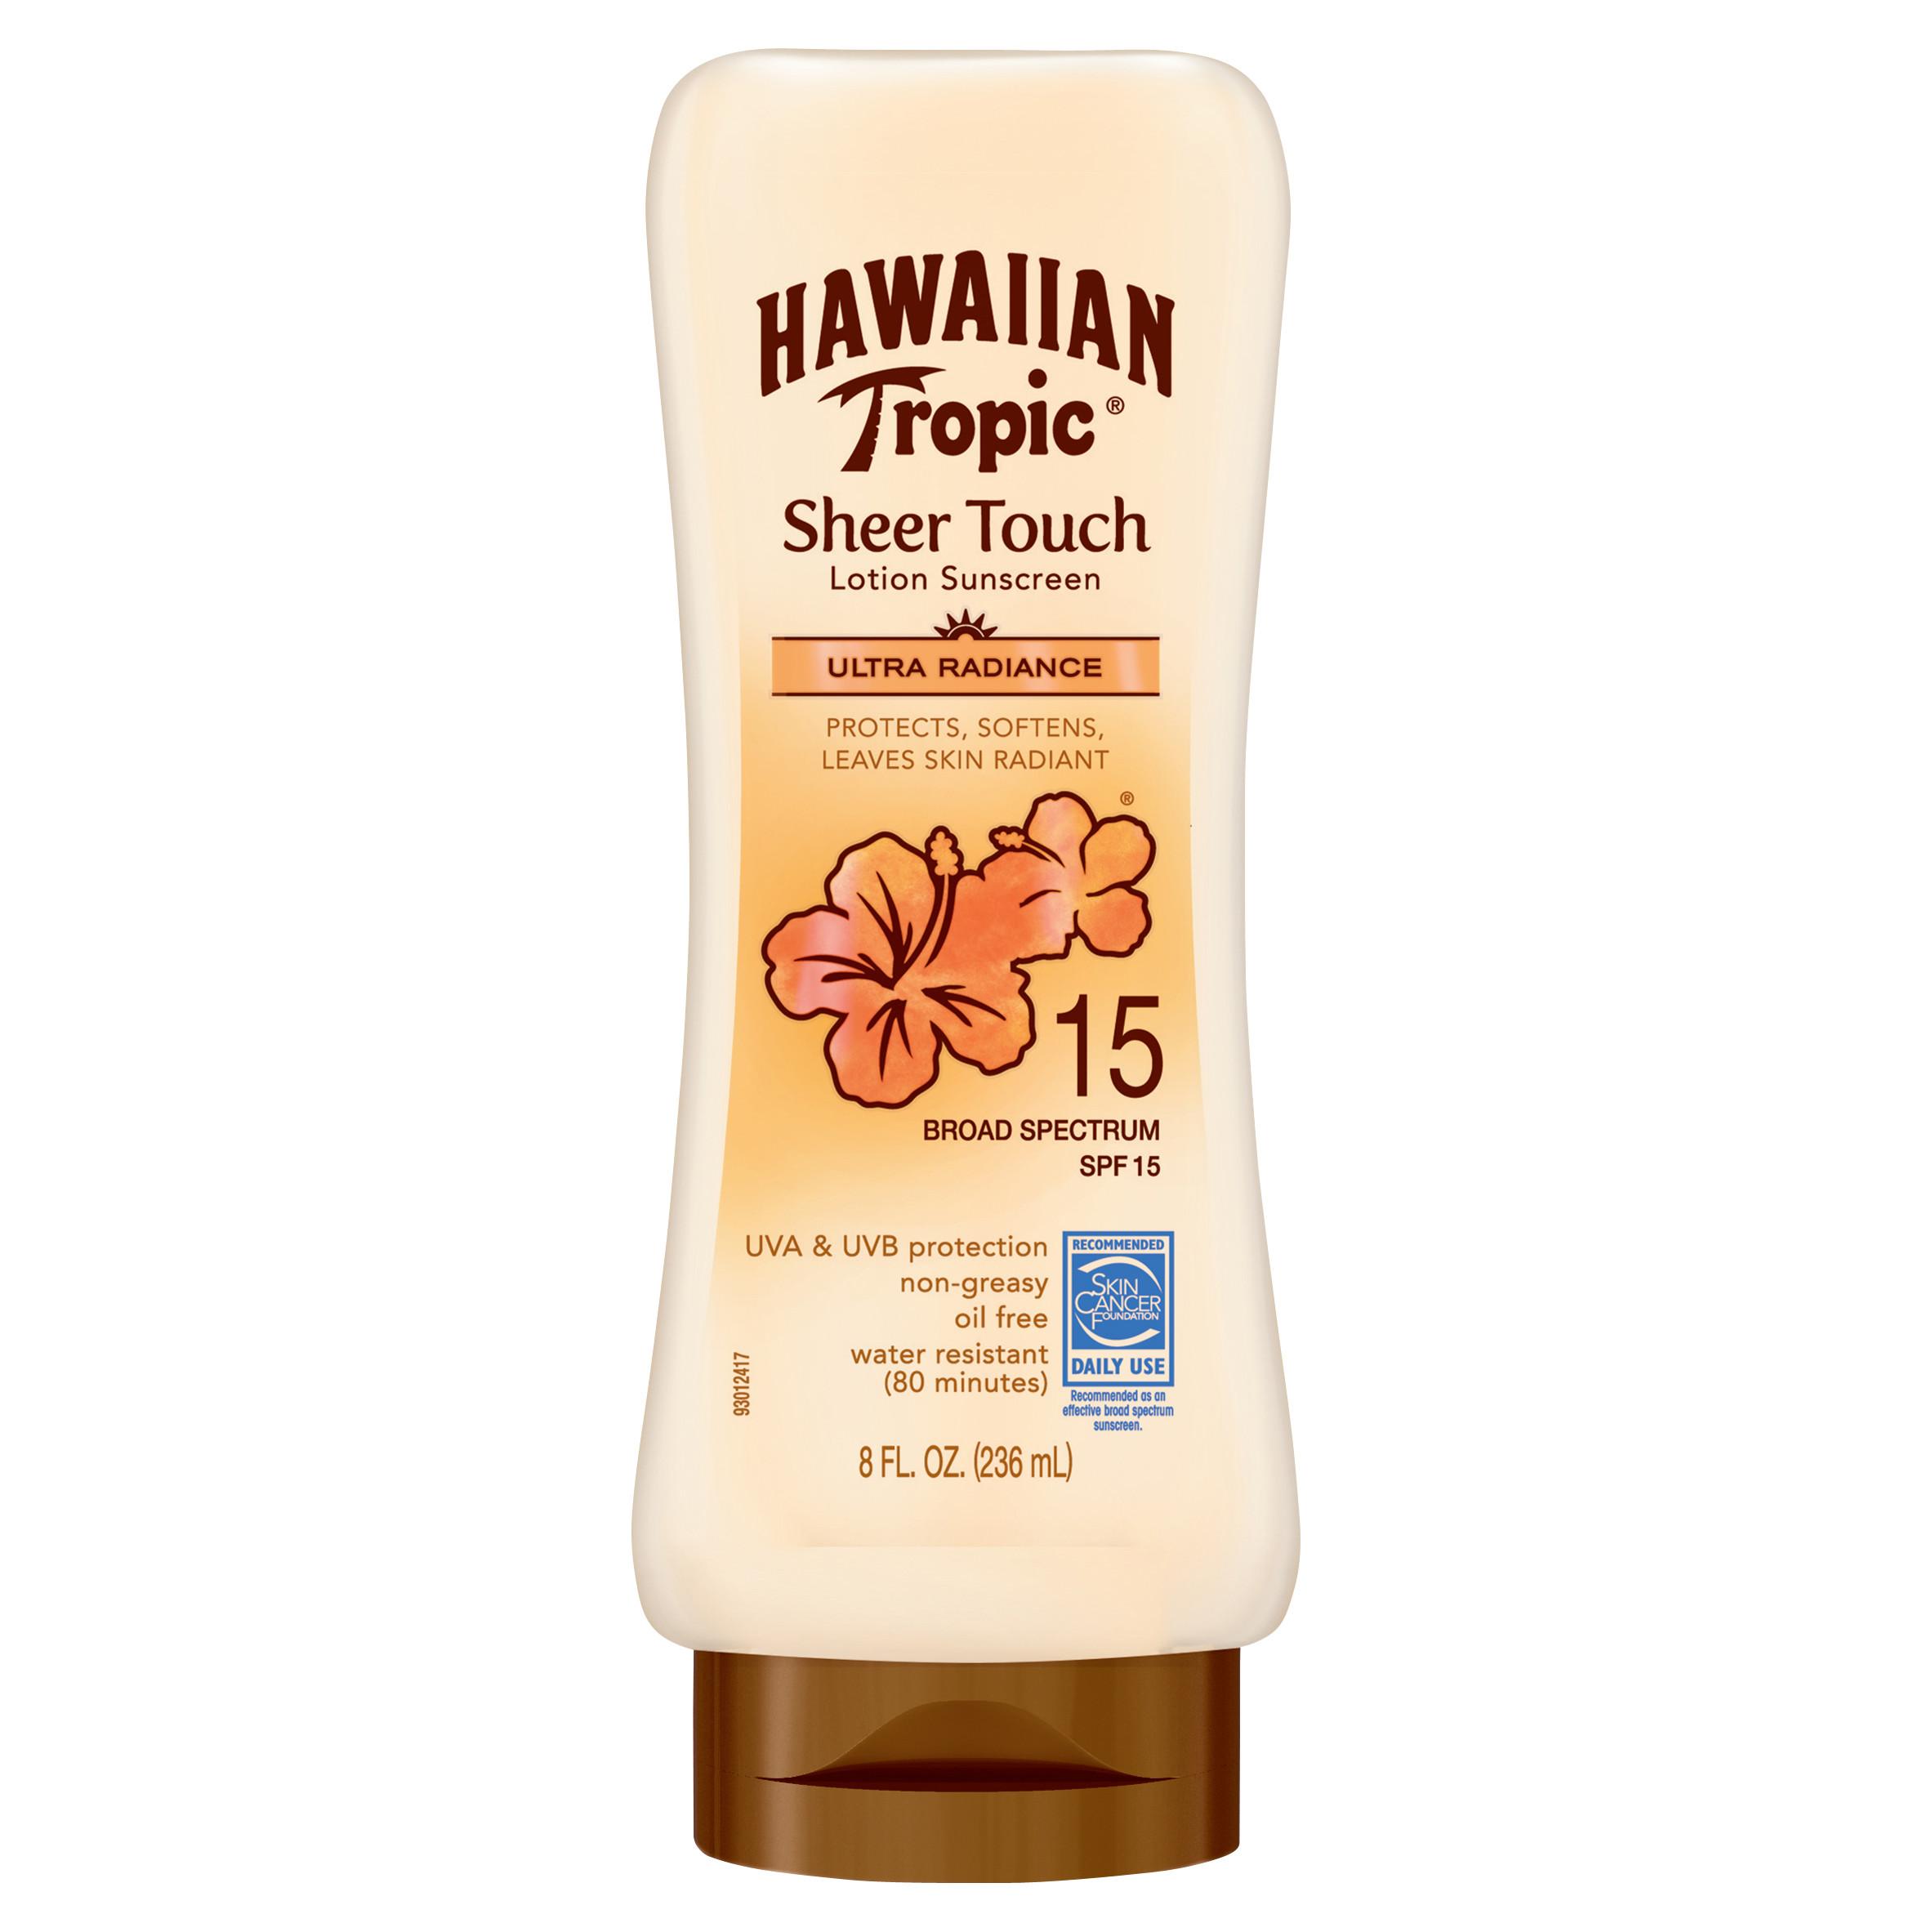 Amazon S&S: Hawaiian Tropic Sheer Touch Lotion Sunscreen SPF 15, 8 Ounces $2.83 + Free Shipping